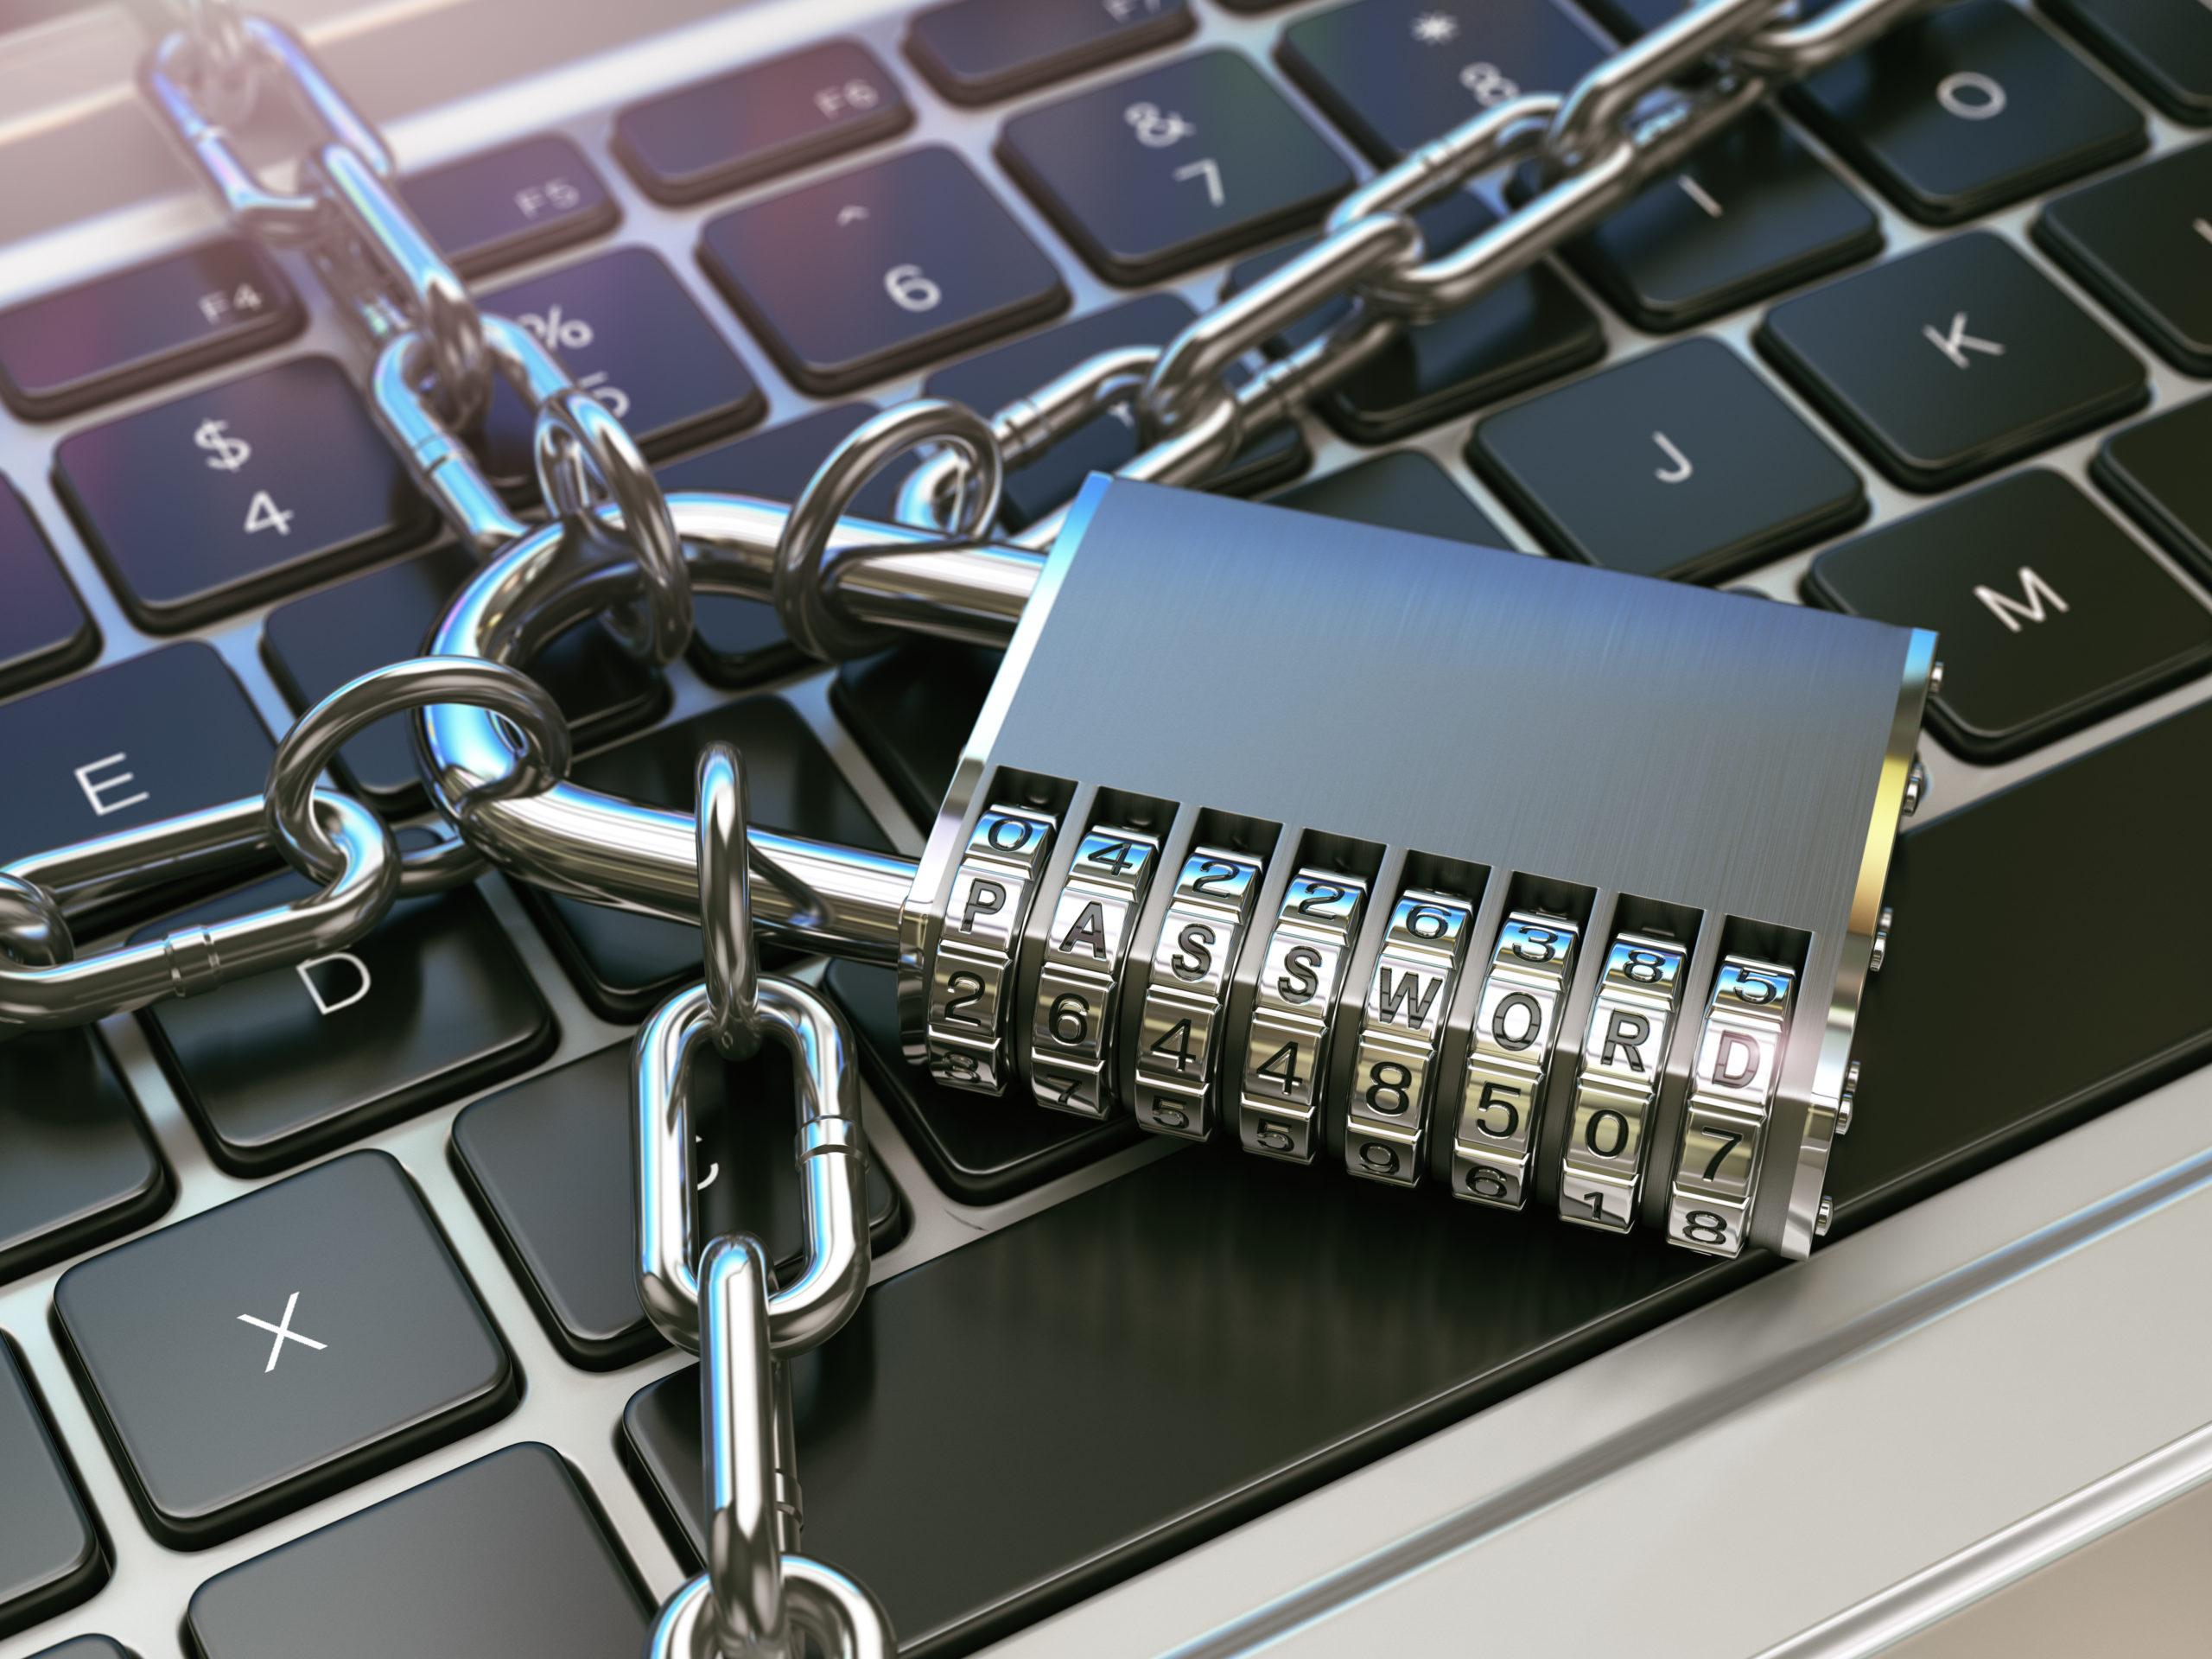 Nutzung privater IT im Unternehmen - Bring your own device (BYOD)